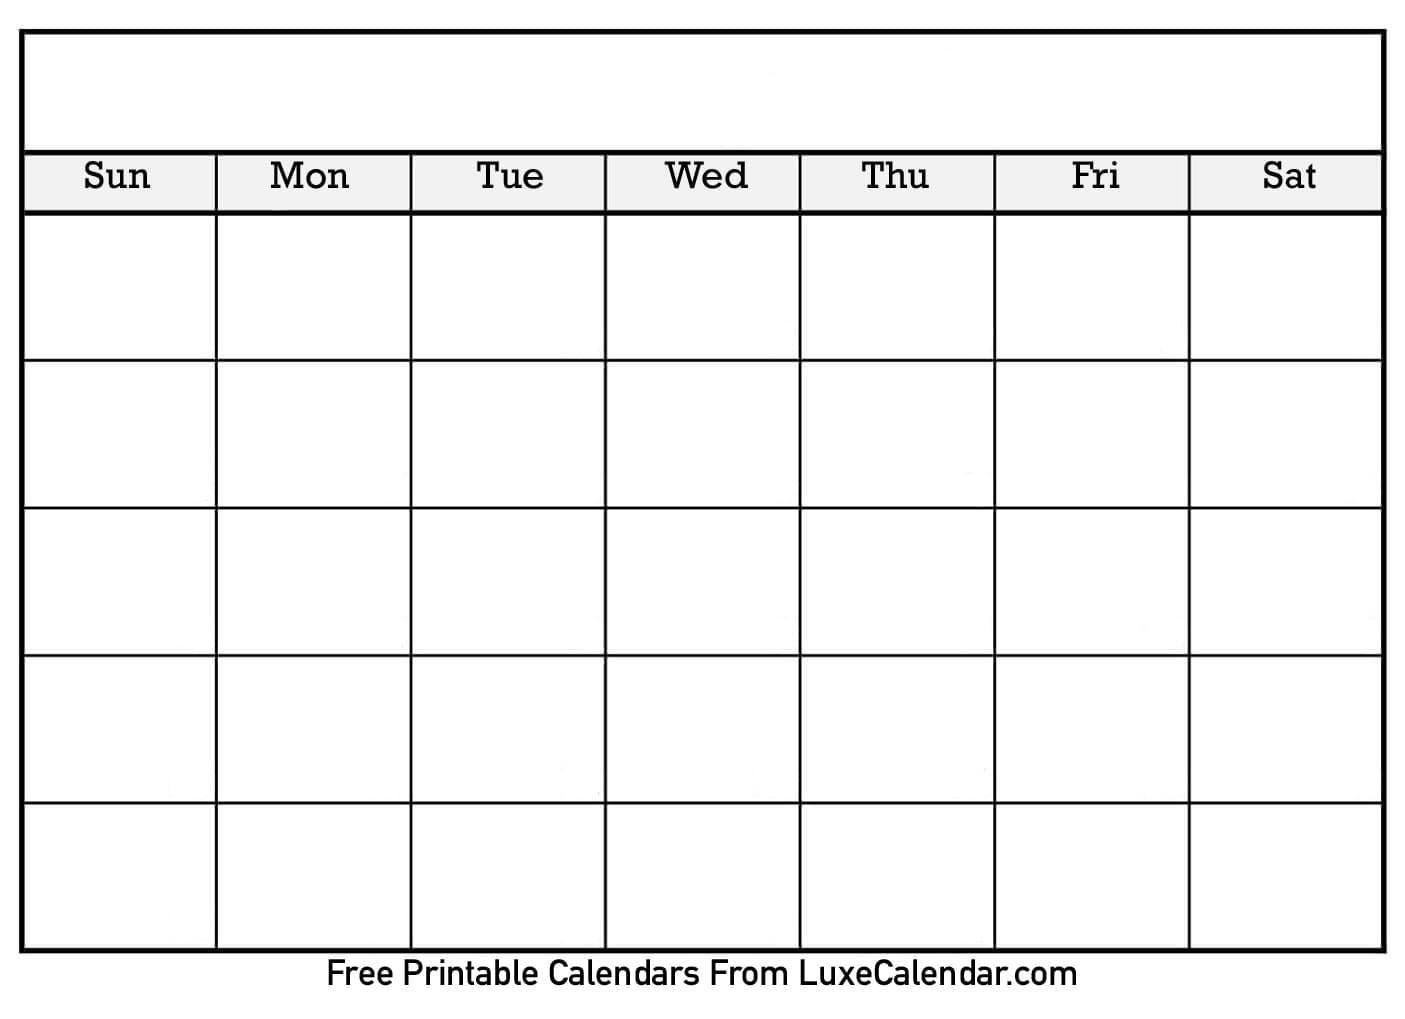 Blank Printable Calendar - Luxe Calendar-Blank Month Calendar Page